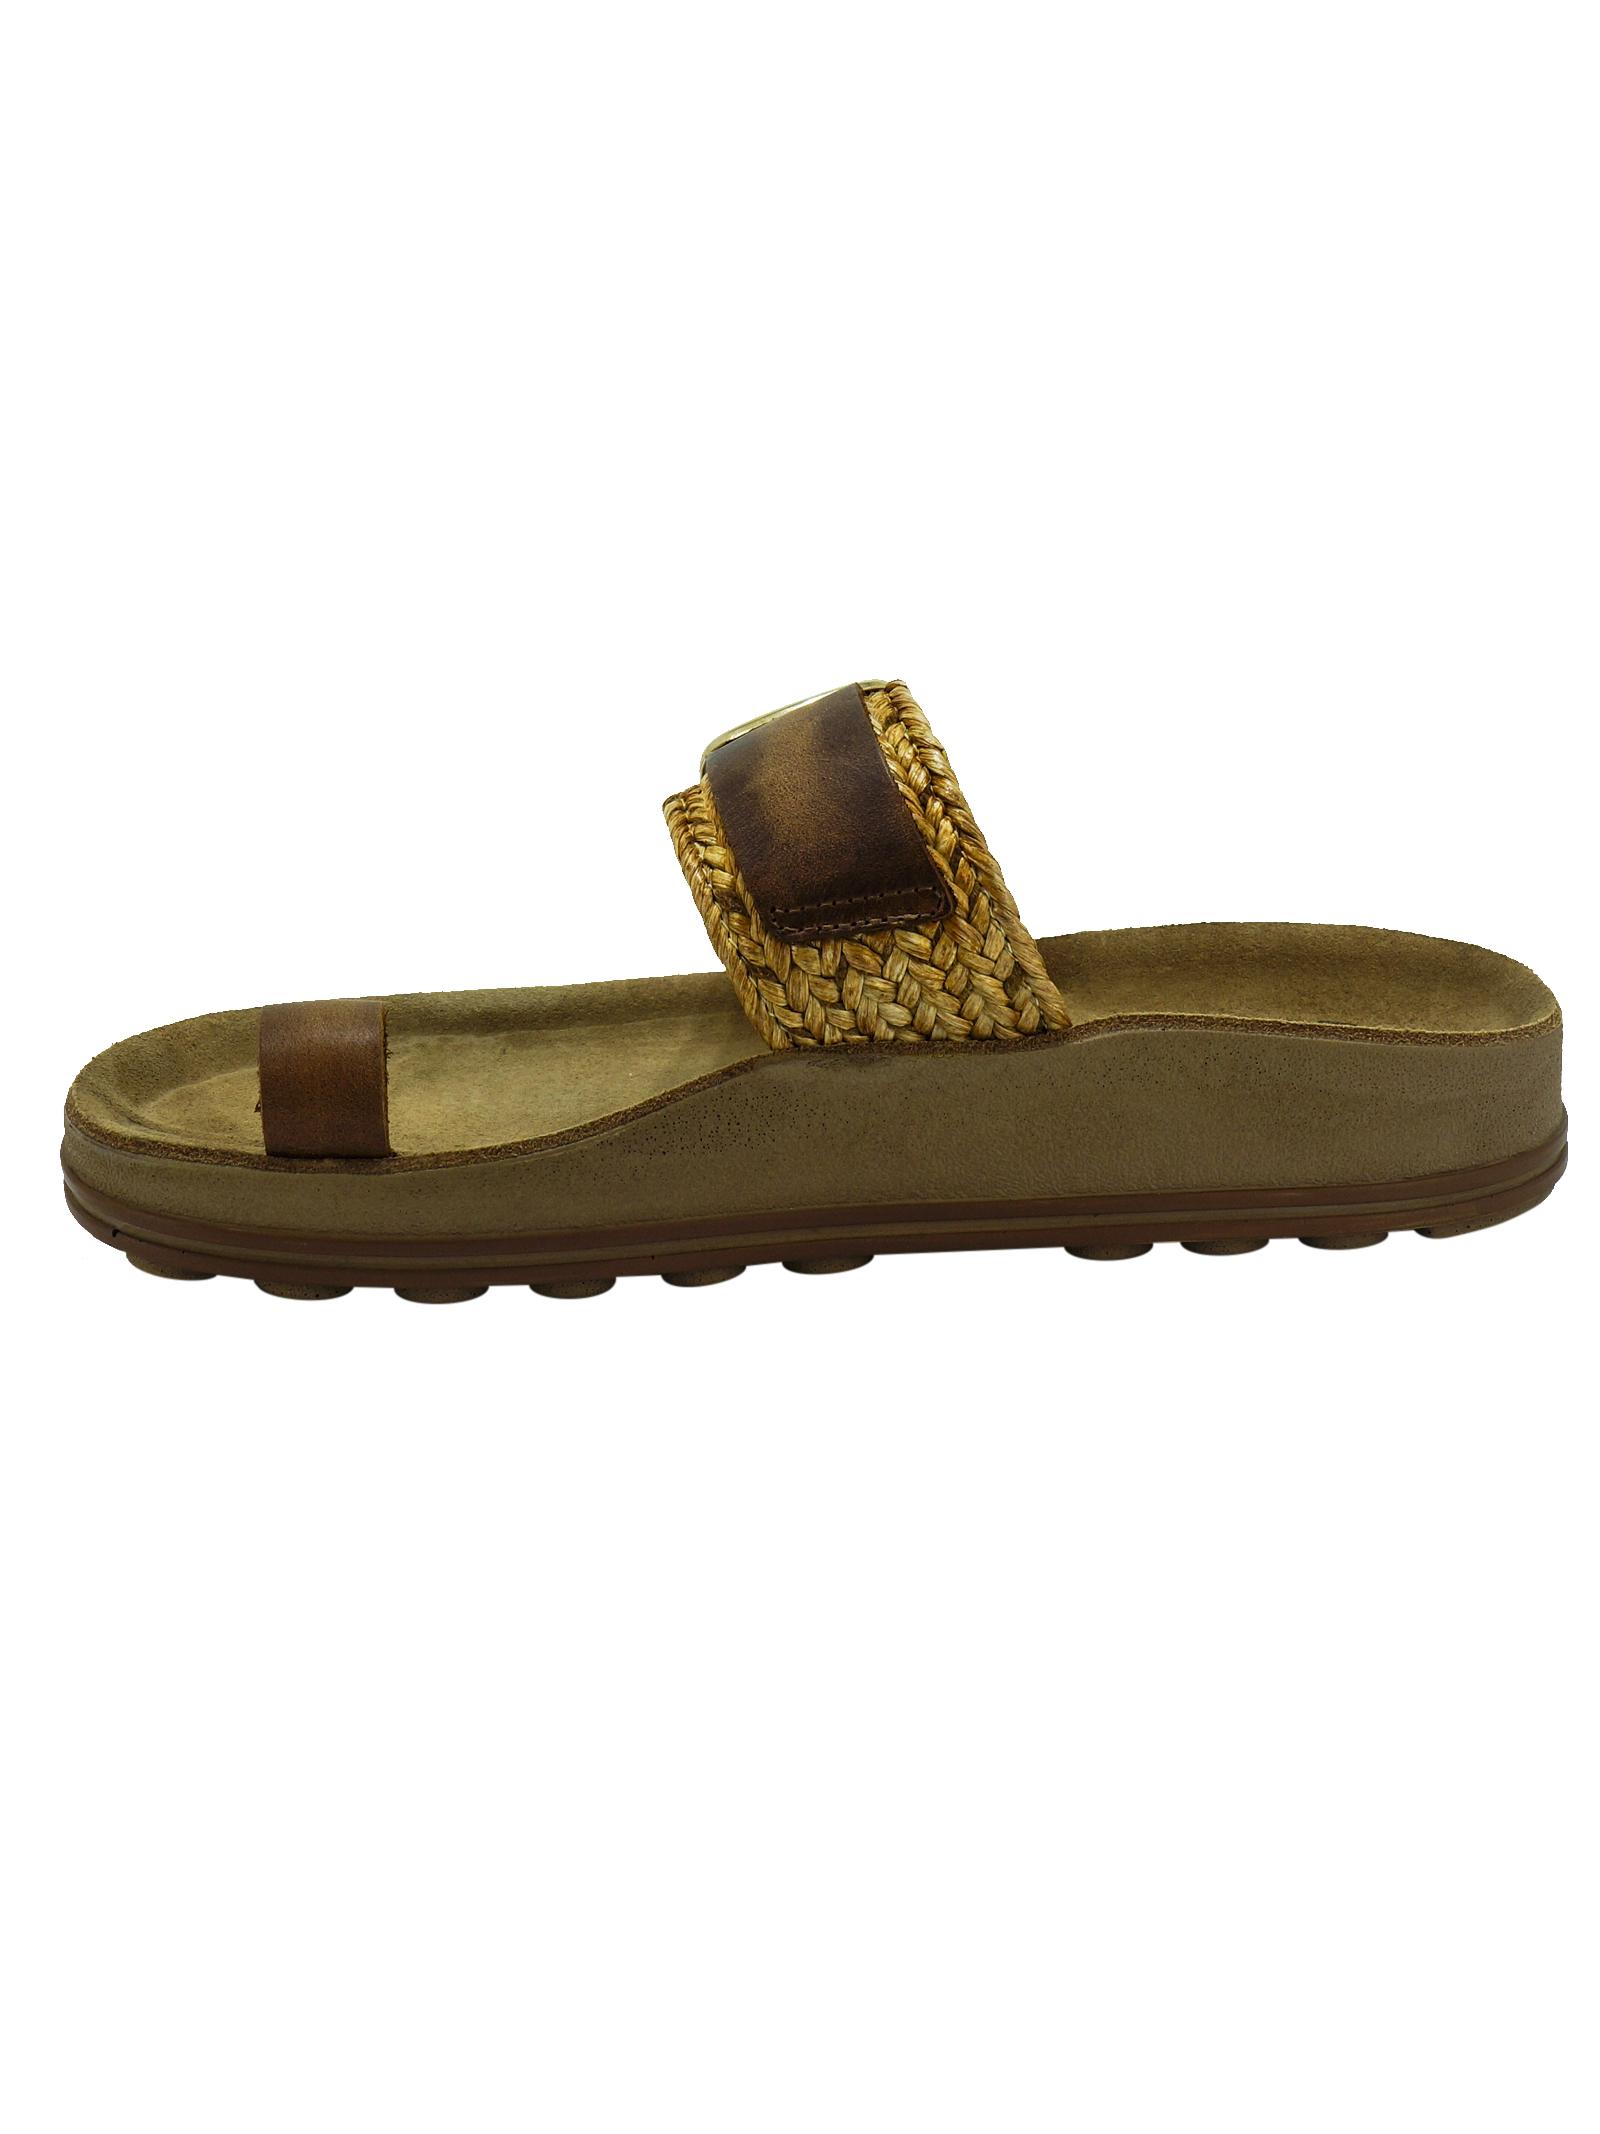 Sandali Infradito Donna Plantare Fantasy Sandals FANTASY SANDALS   Sandali   S320TAUPE